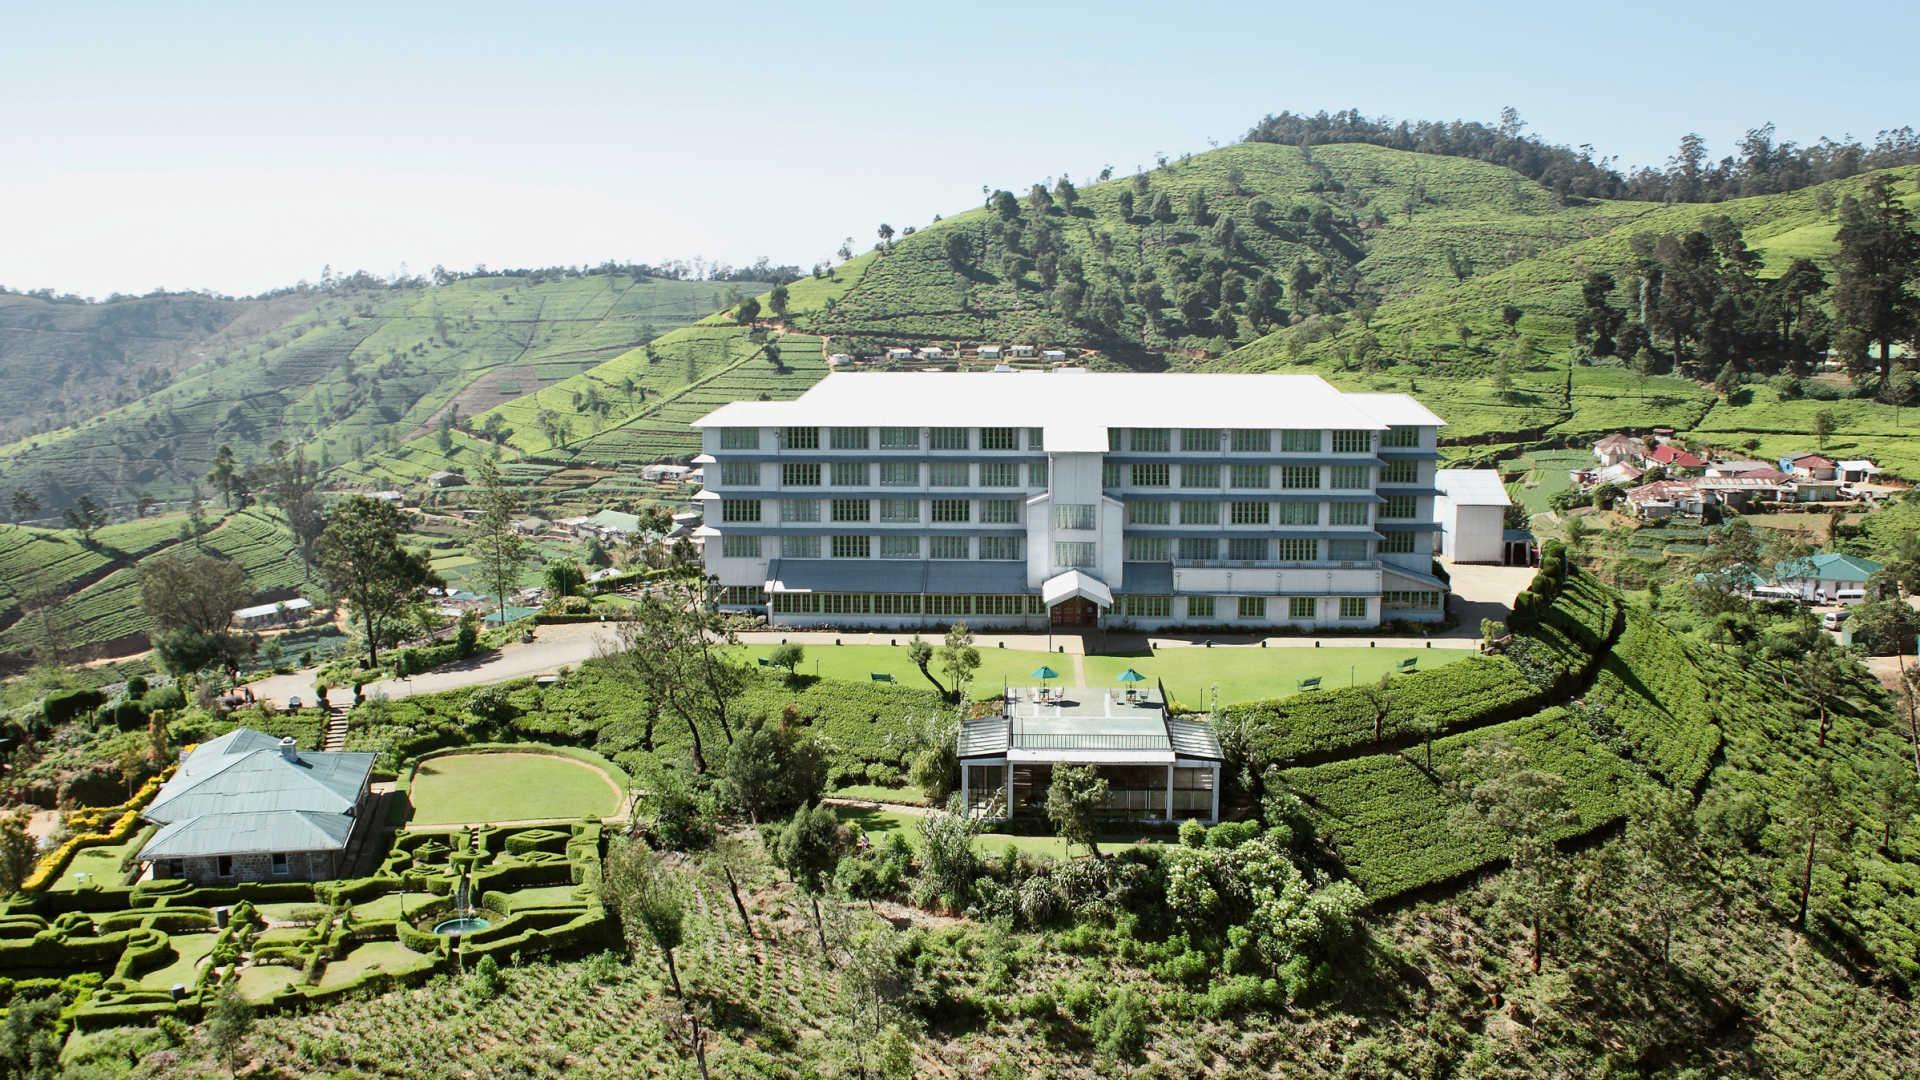 The tea factory in Nuwara Eliya